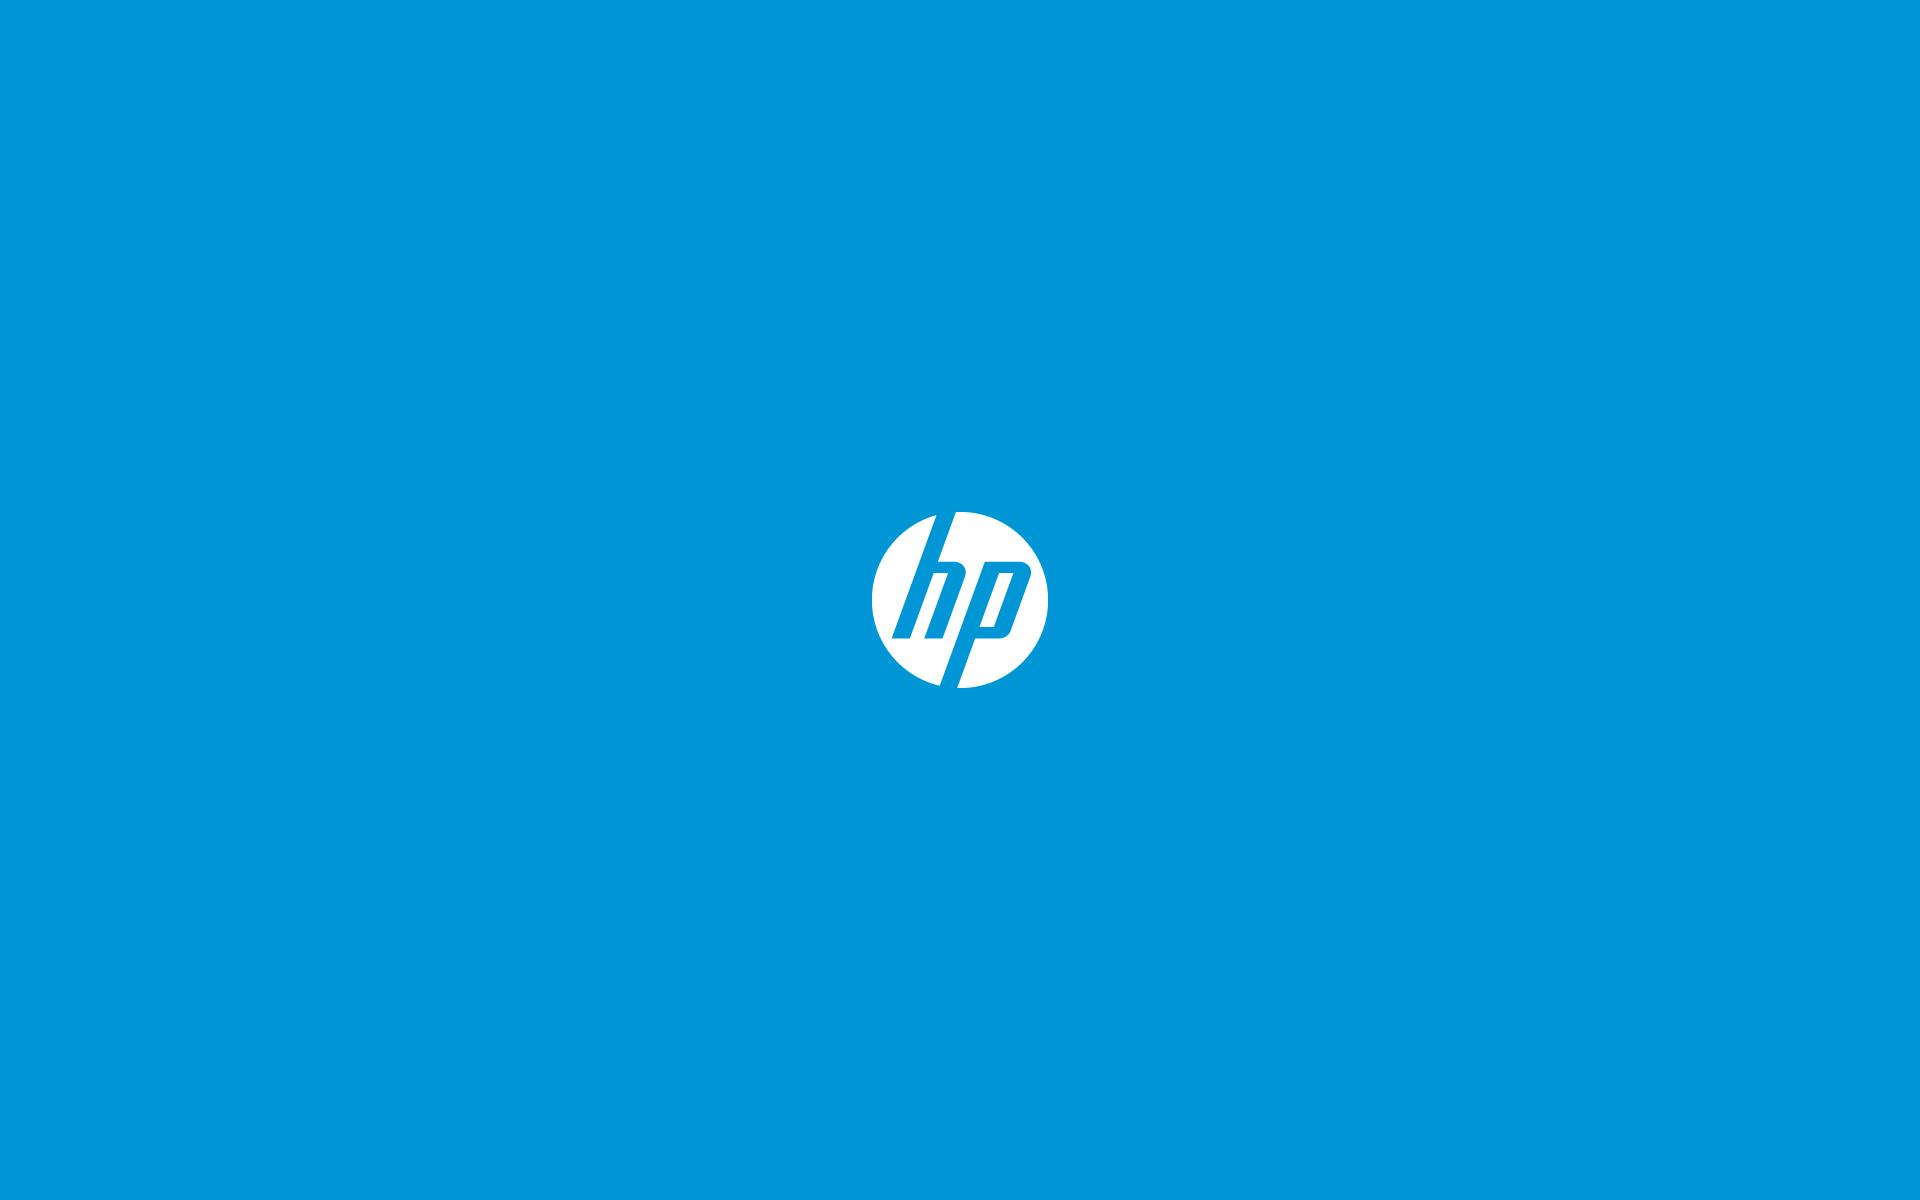 HP Desktop Wallpaper (64+ Images